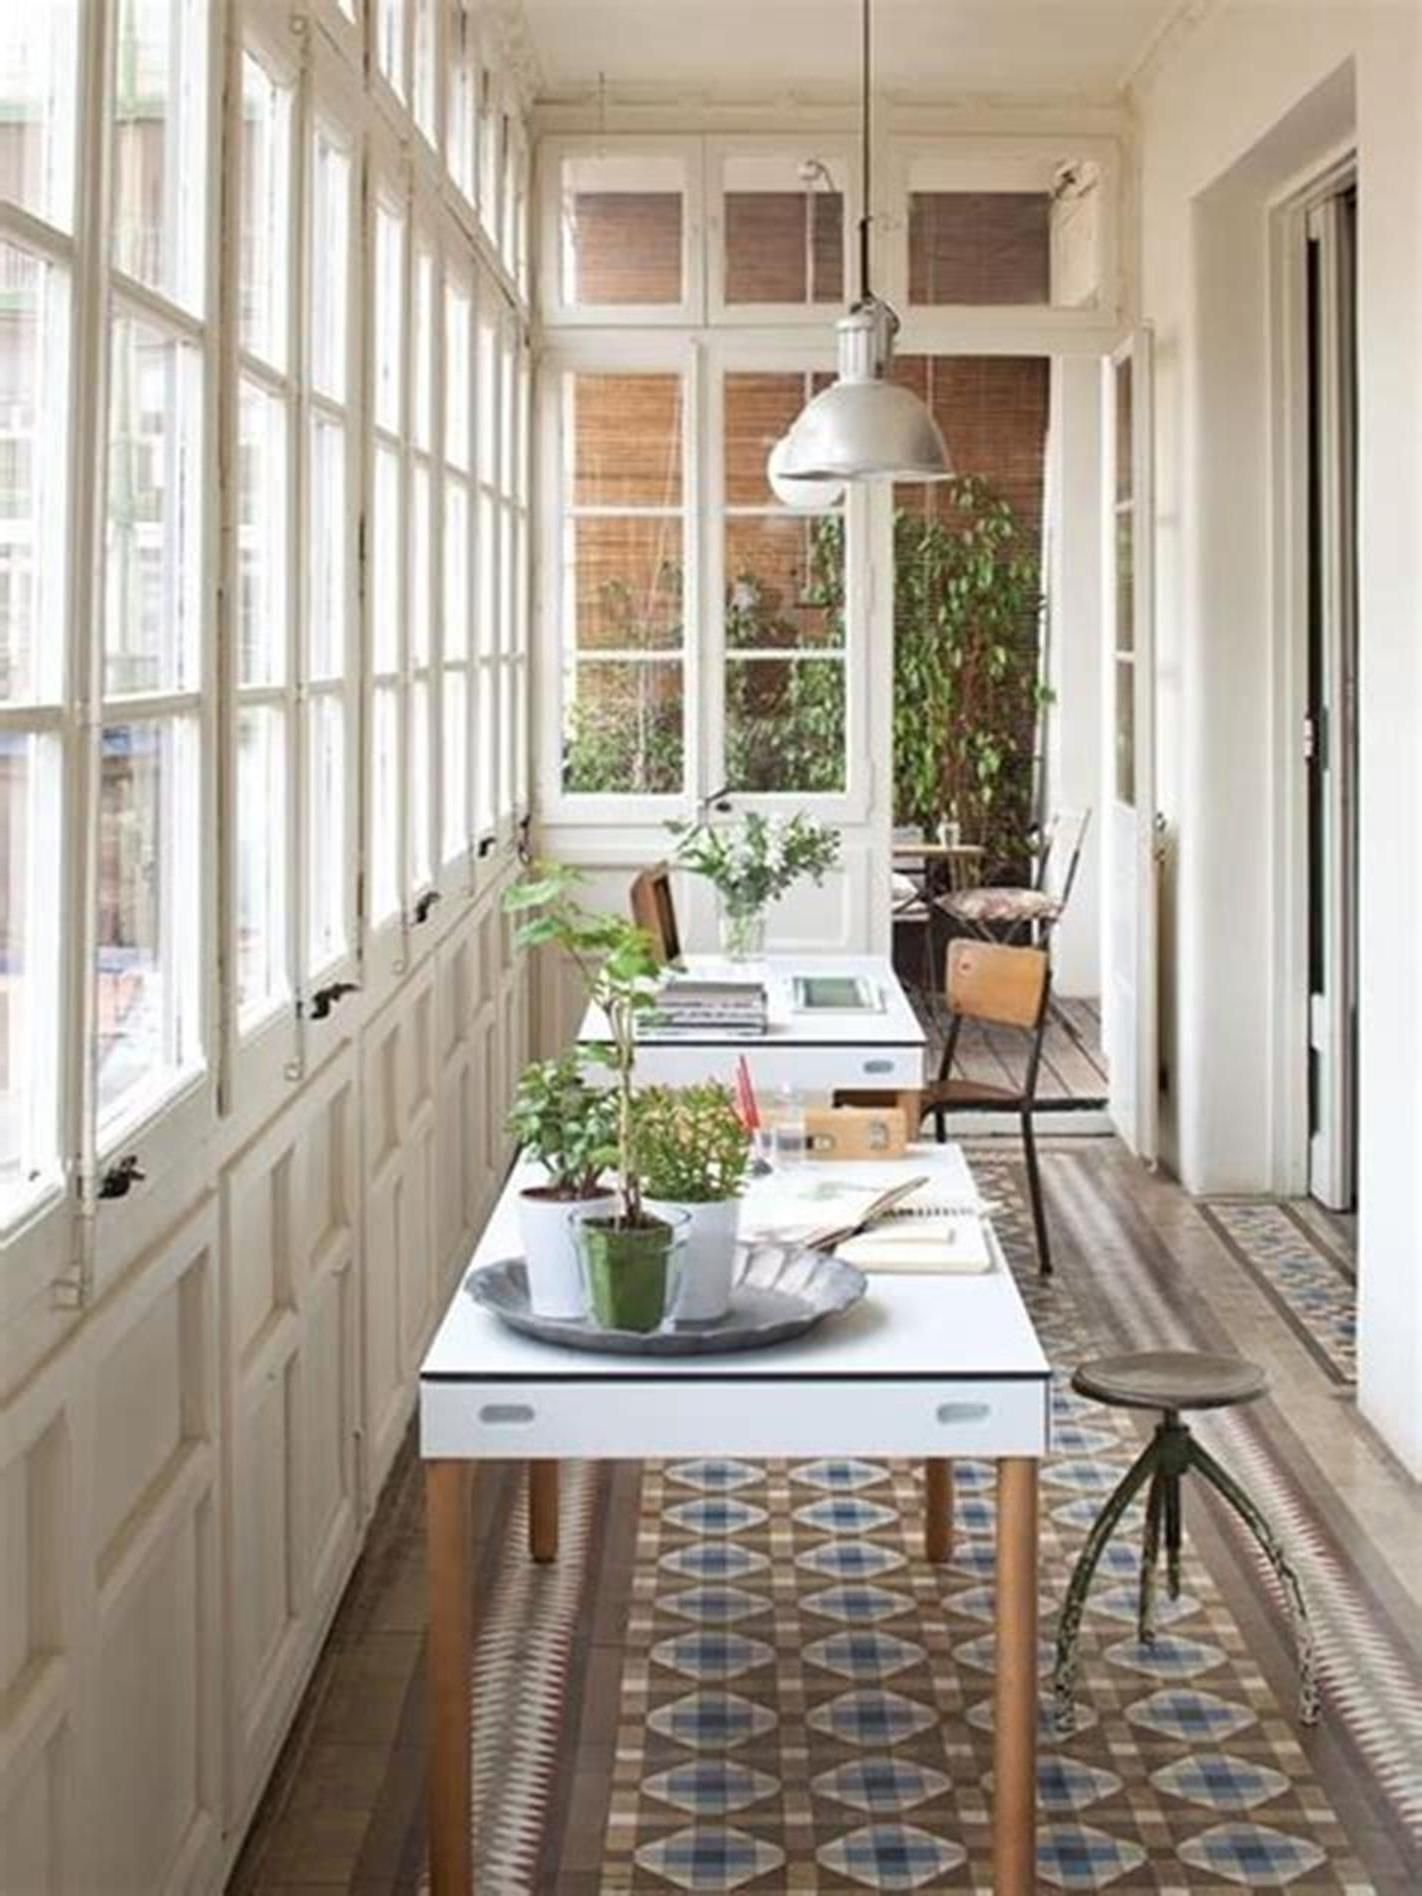 9 Stunning Sunroom Decor and Design Ideas   Sunroom decorating ...